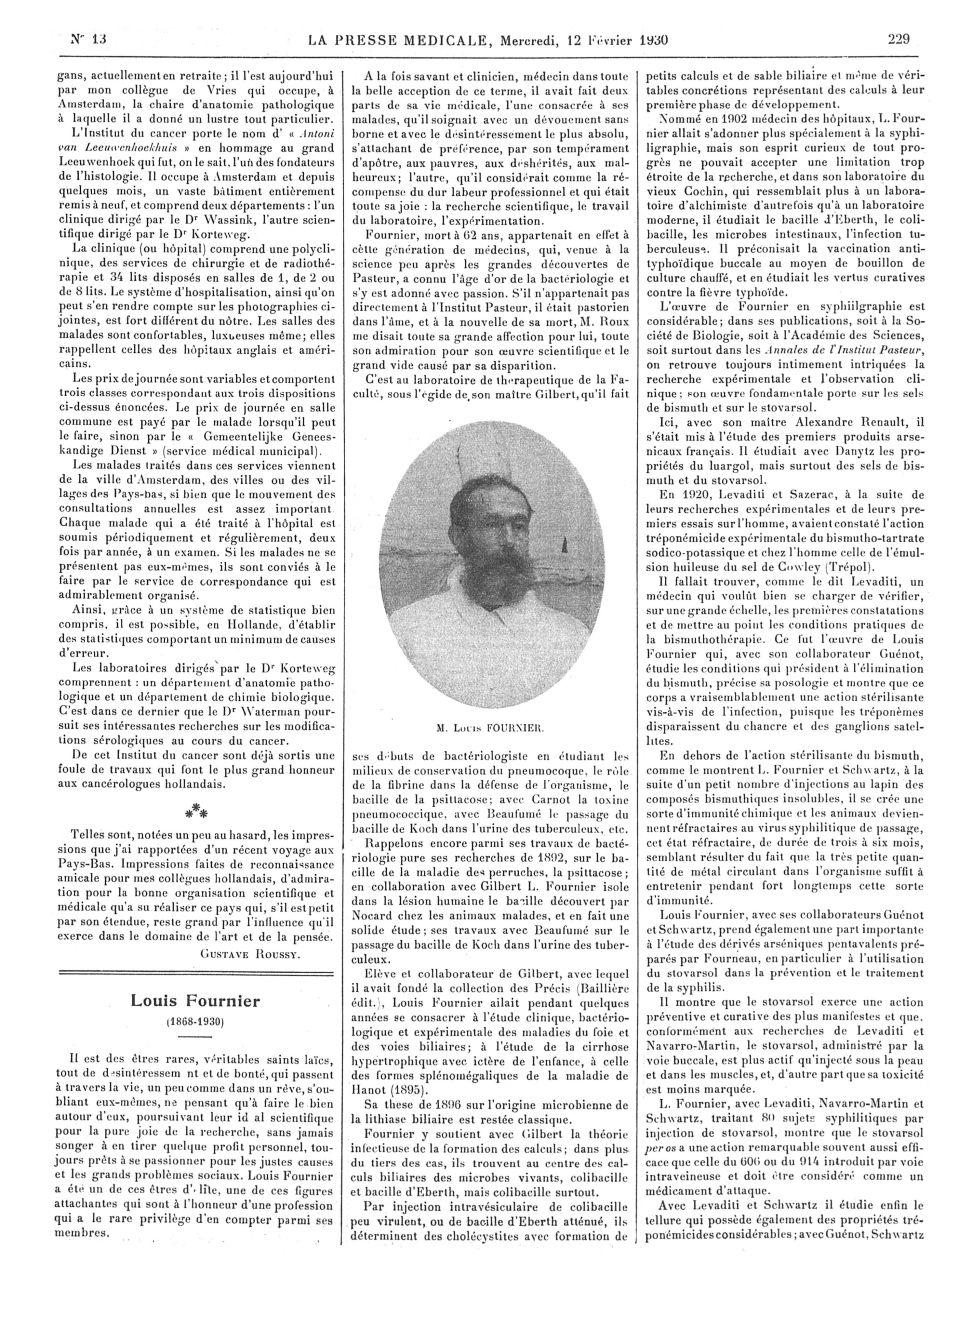 M. Louis Fournier - La Presse médicale - [Articles originaux] -  - med100000x1930xartorigx0229